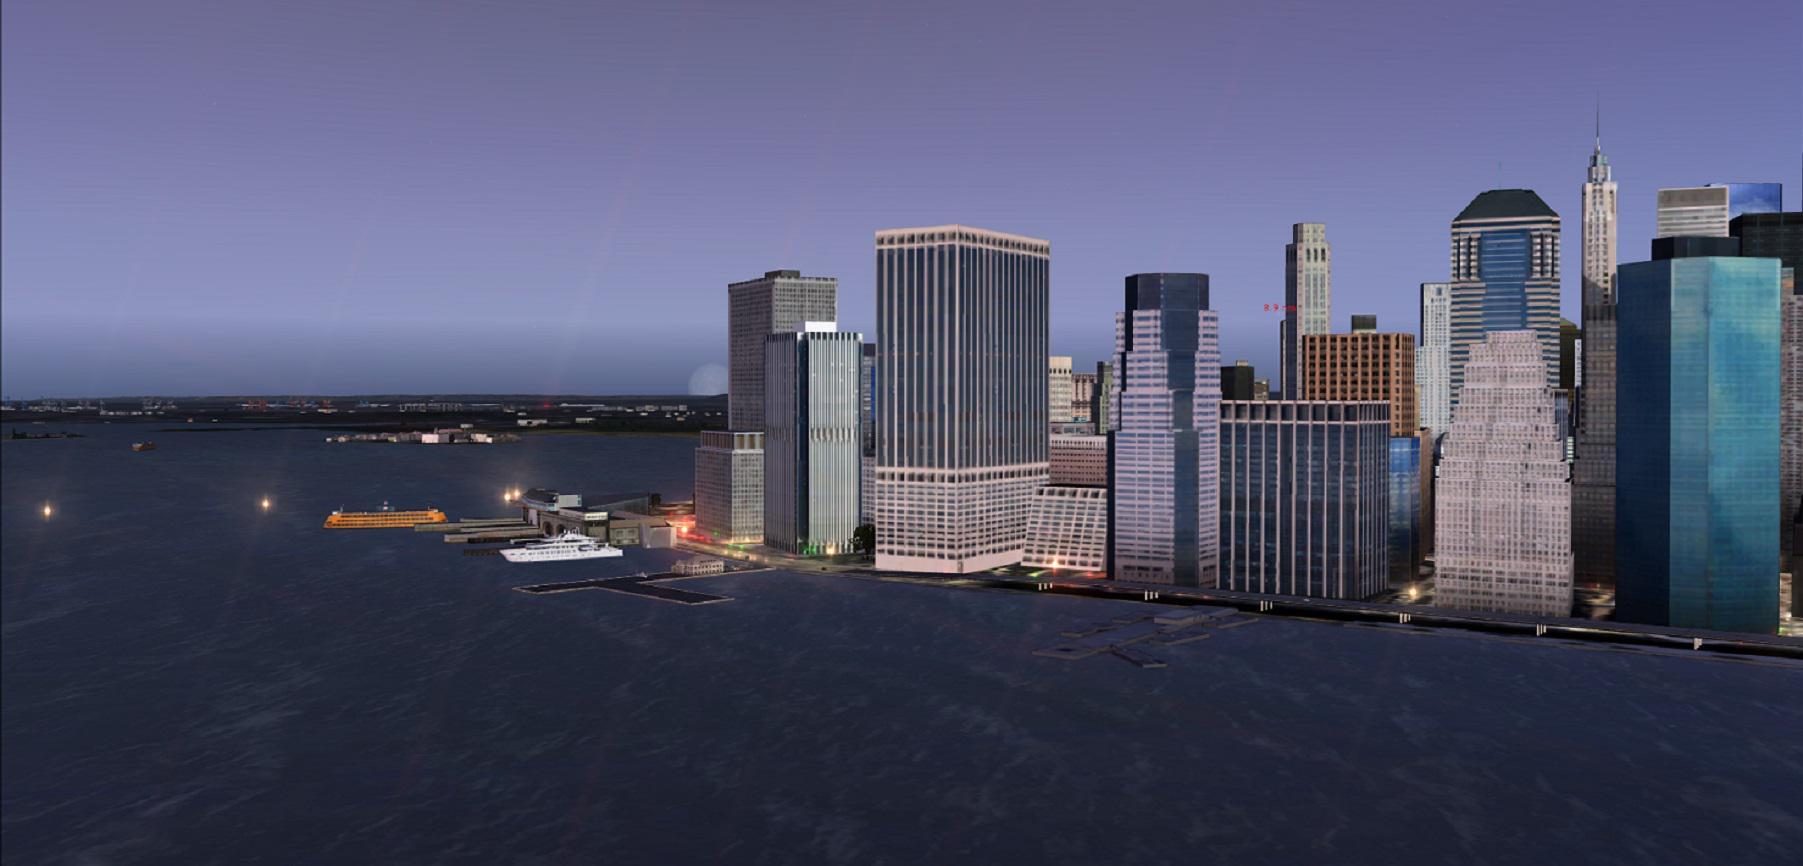 FSDT New York KJFK and Drzewiecki Designs New York City V2